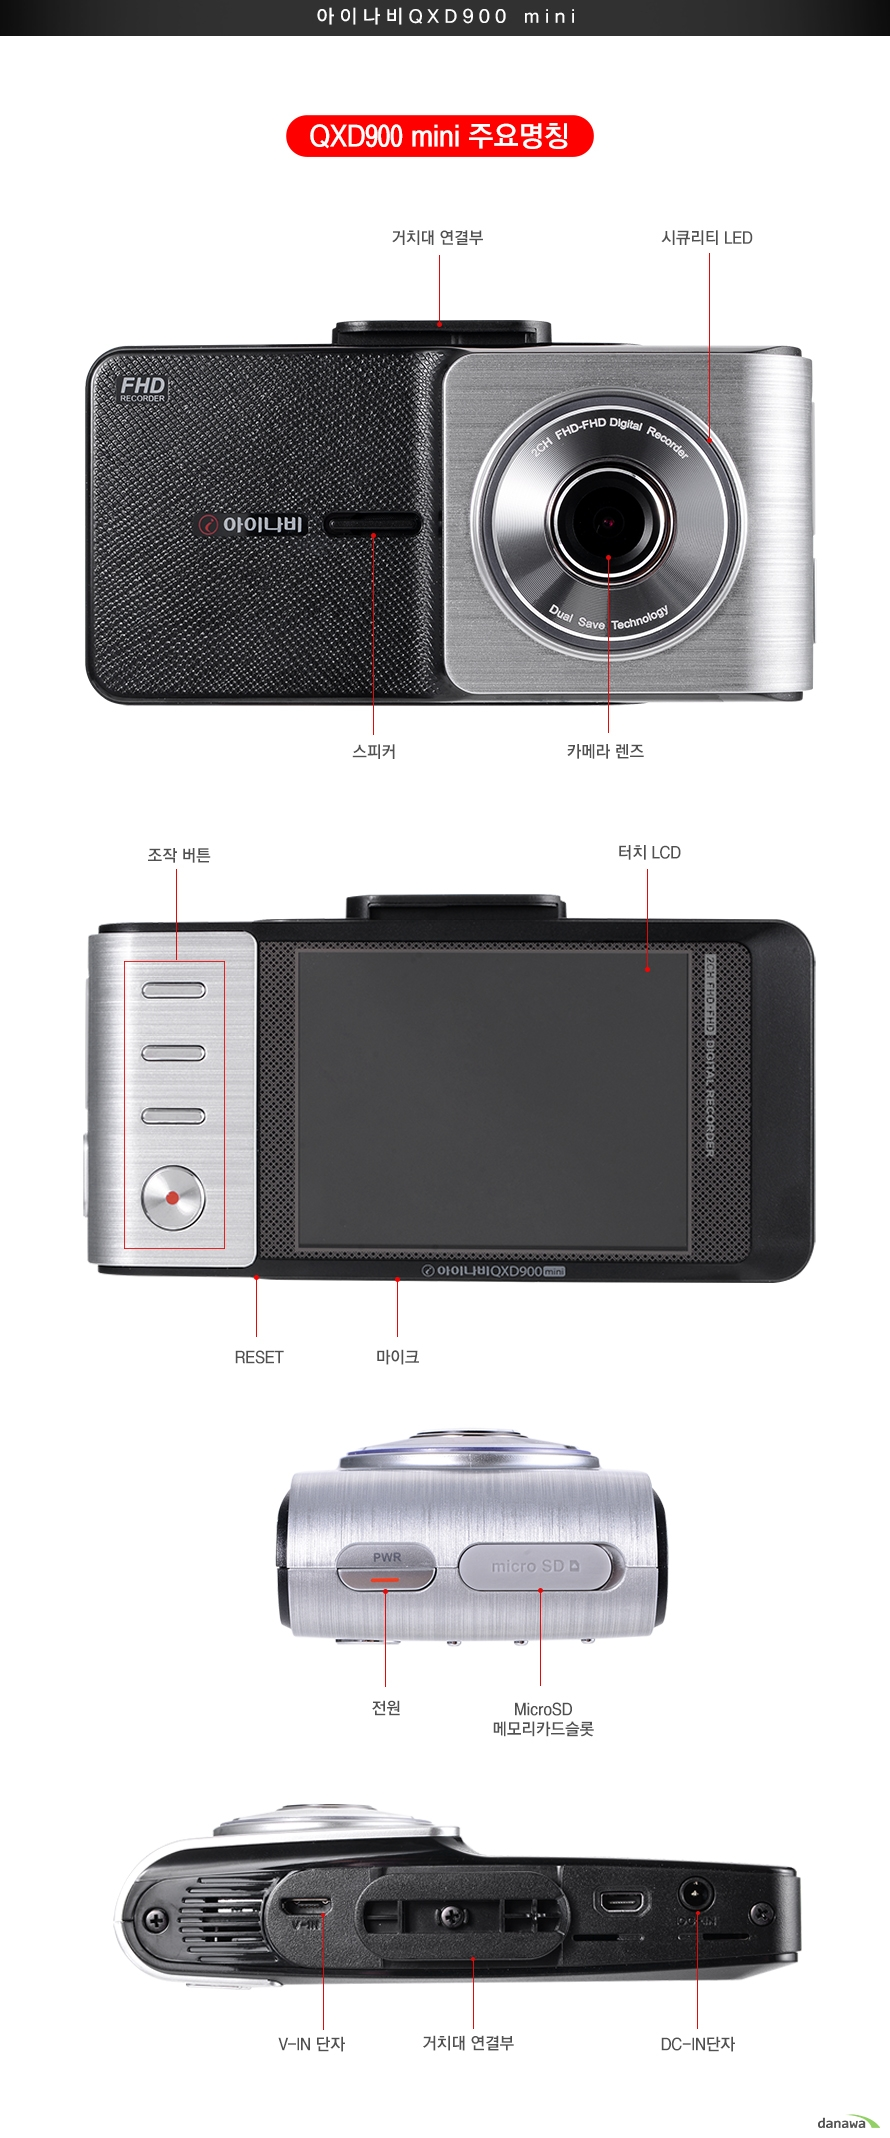 QXD900mini 주요명칭거치대 연결부 시큐리티LED 스피커 카메라 렌즈조작버튼 터치LCD Reset 마이크전원 MicroSD메모리카드 슬롯V in 단자 거치대연결부 DC IN단자